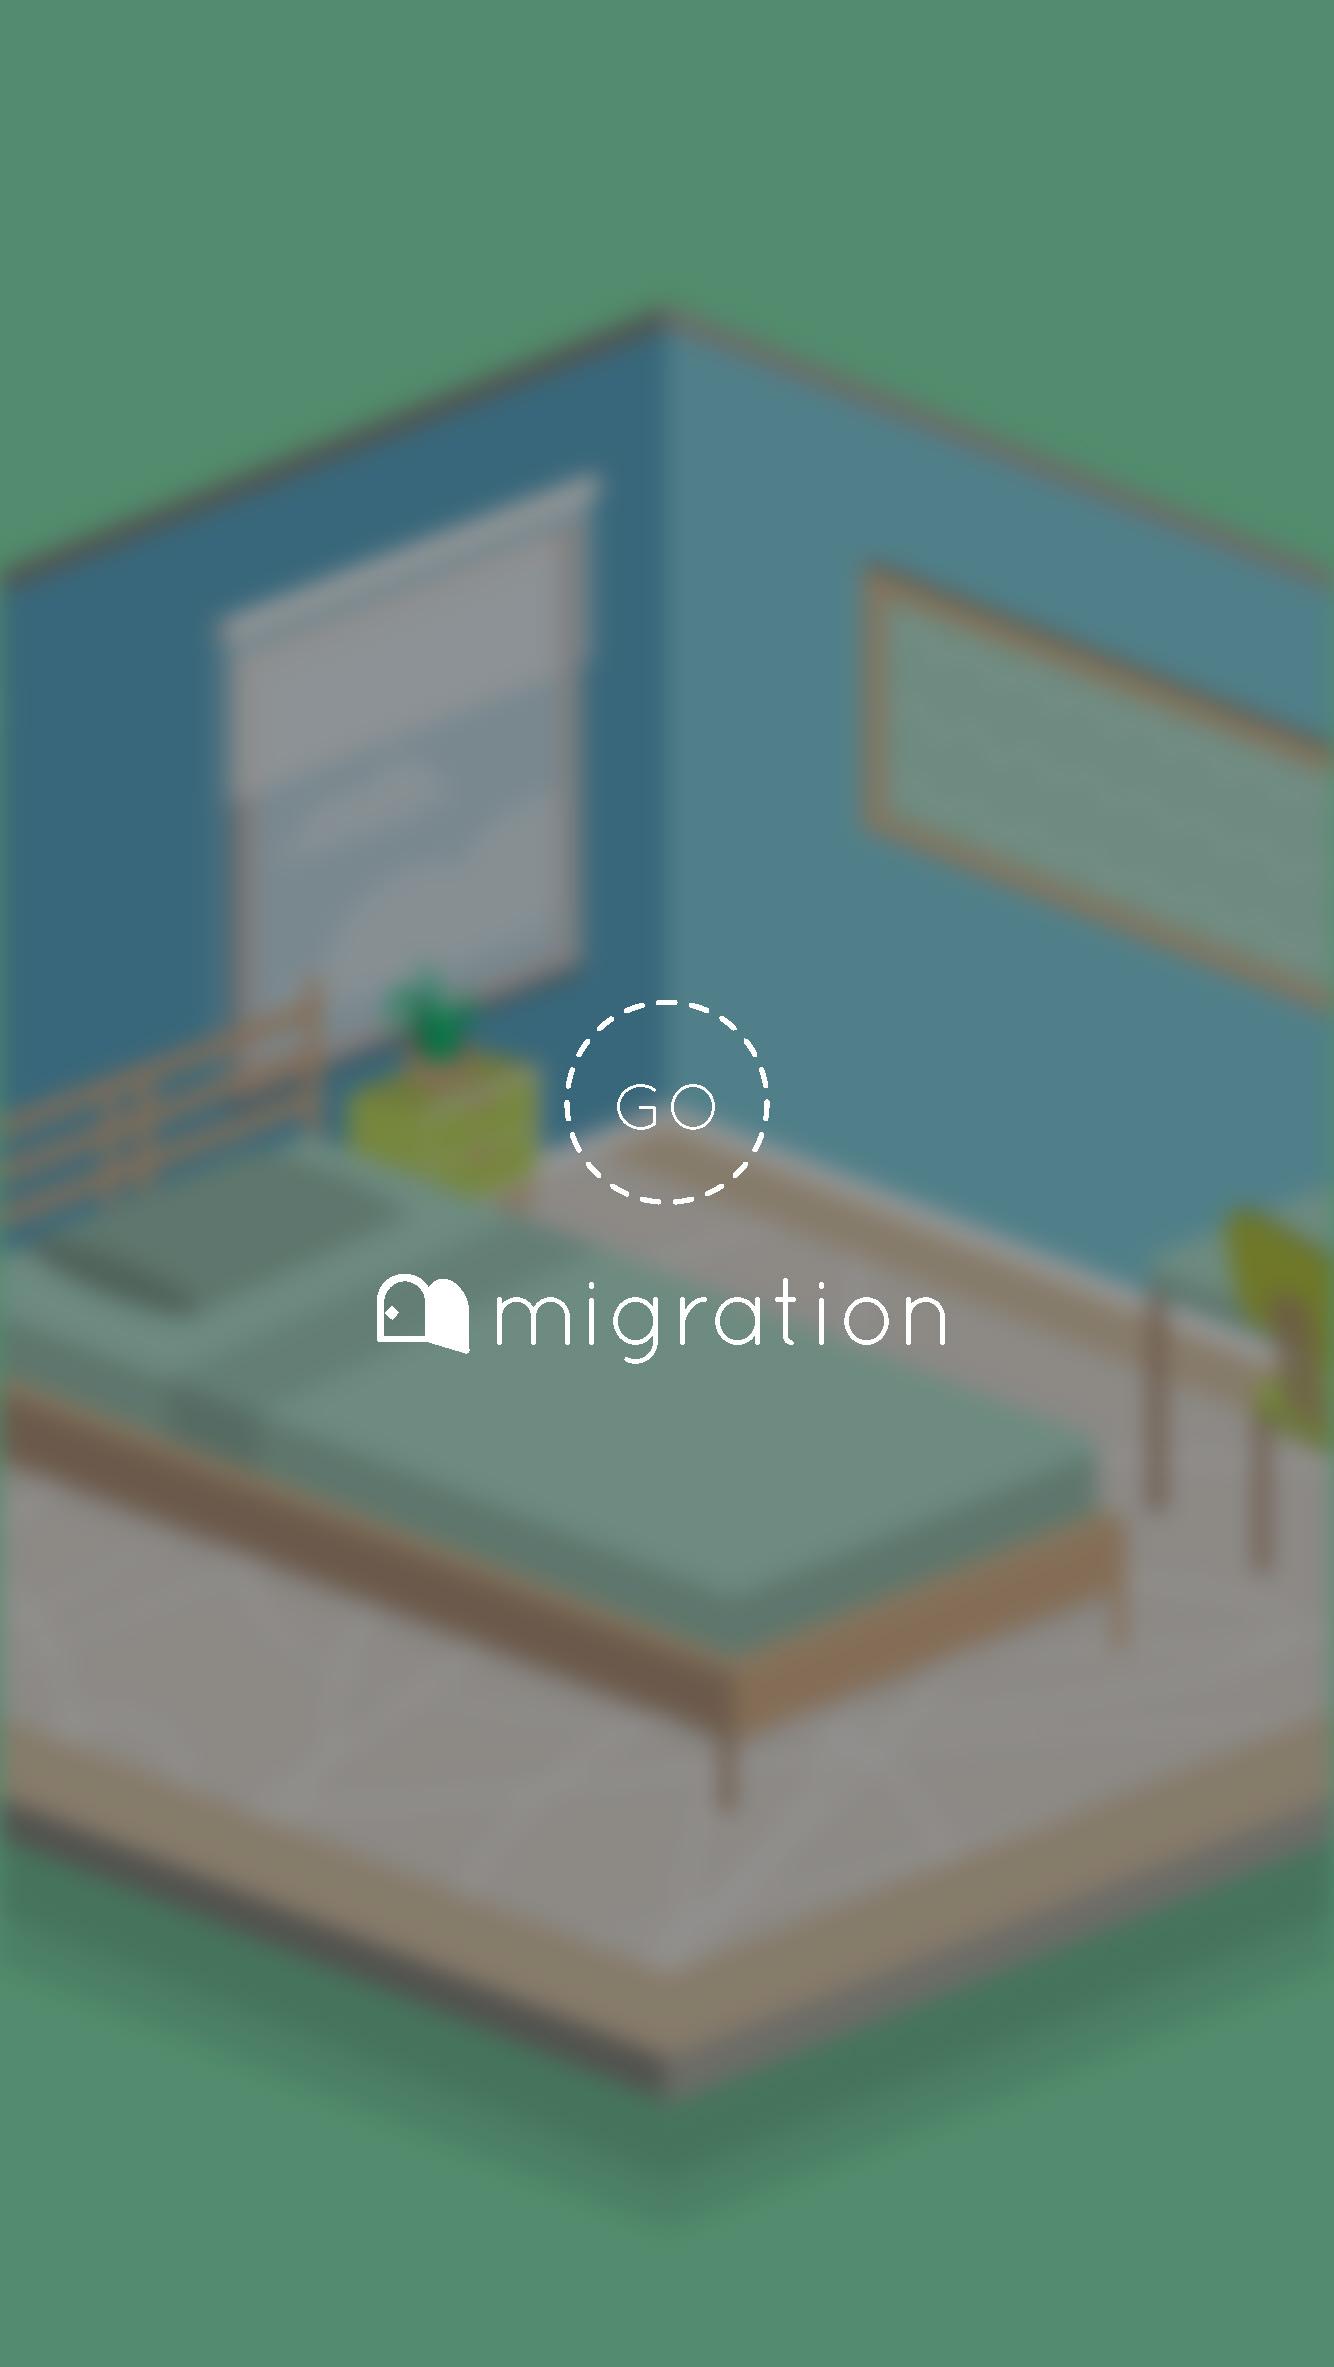 Migration_App1_Page_1.jpg